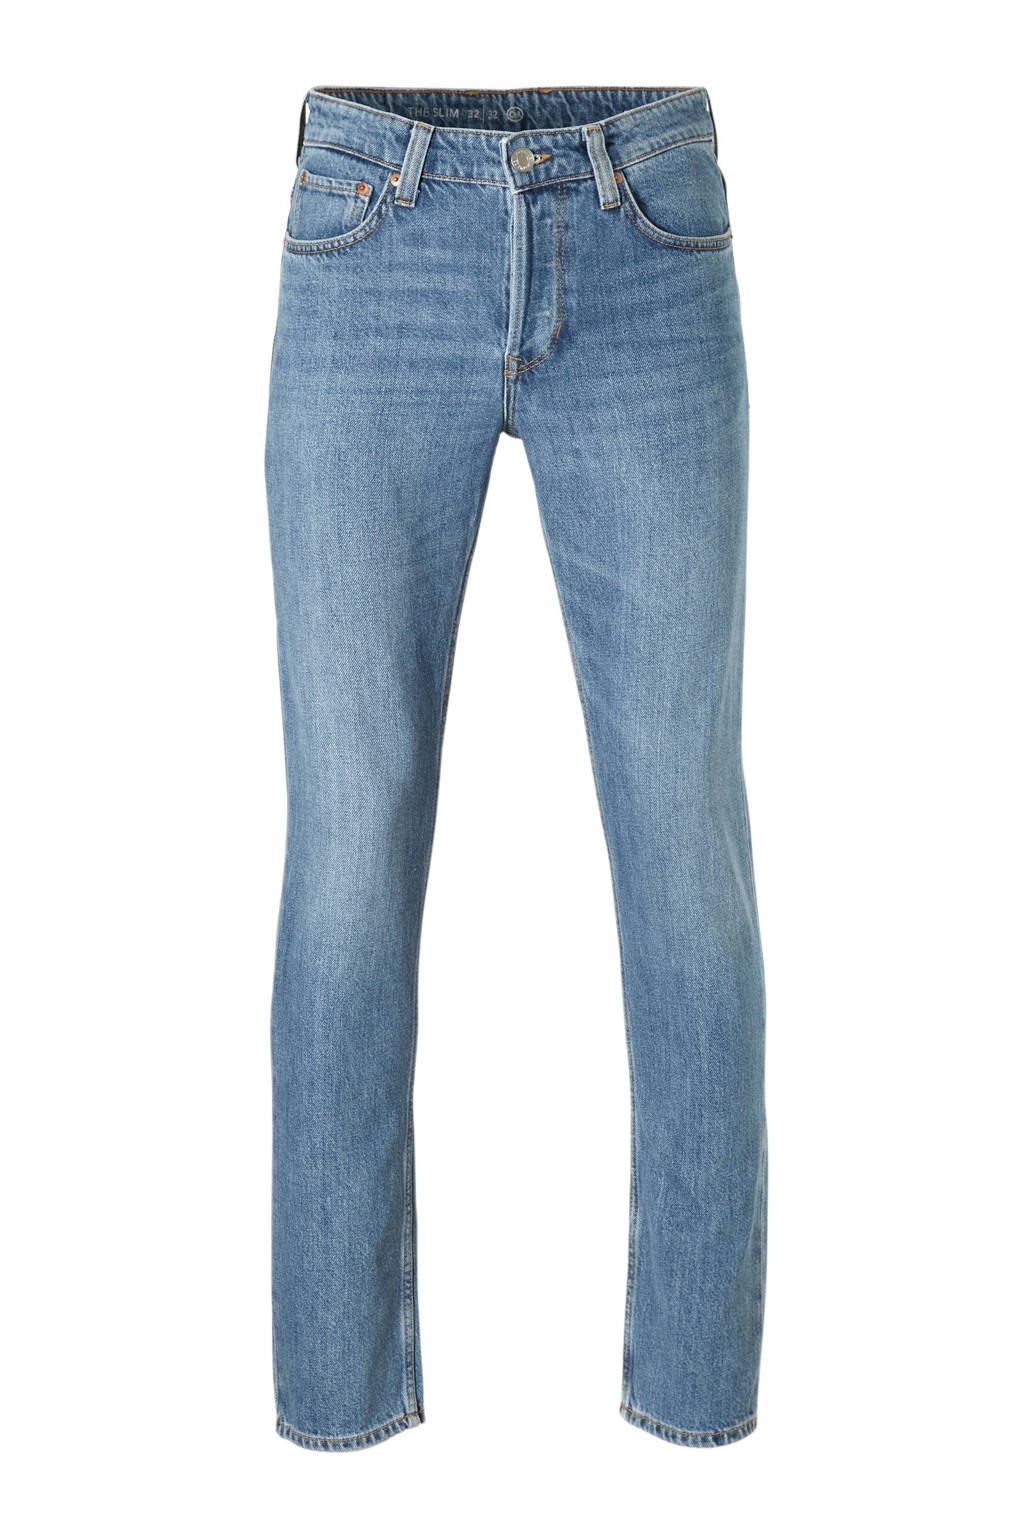 C&A The Denim slim fit jeans, Light denim